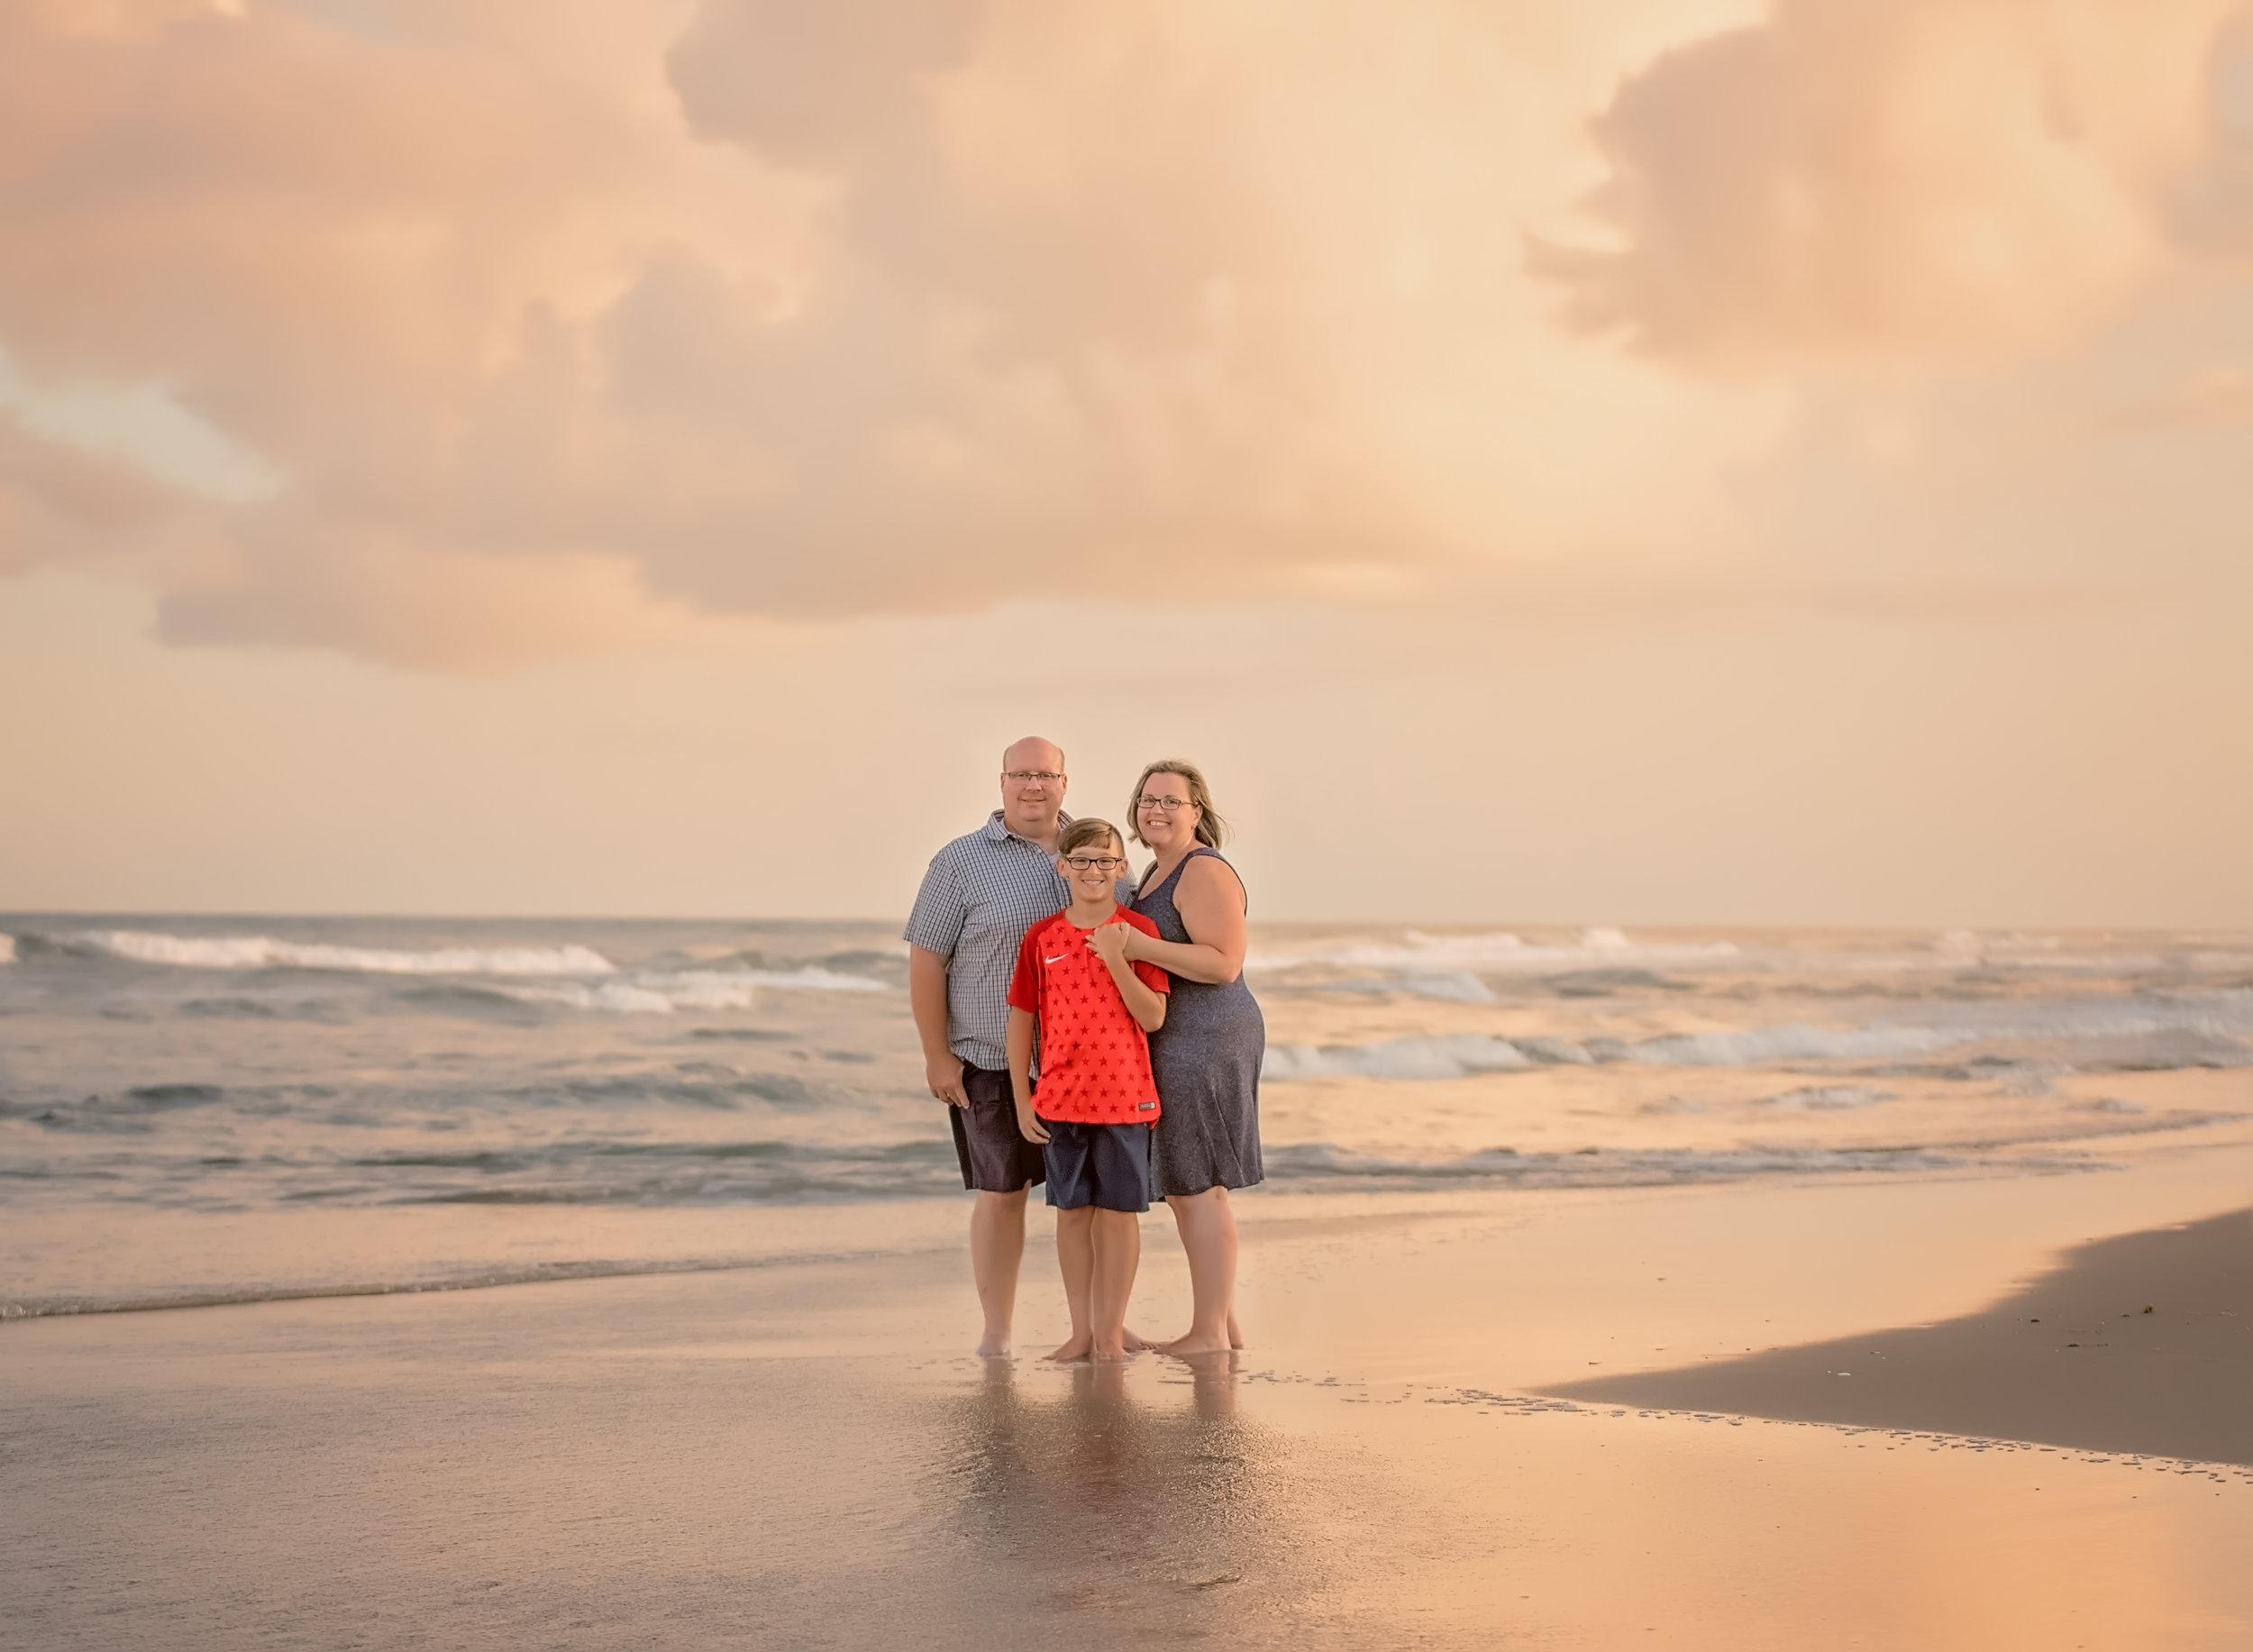 sunset family beach portrait at ocracoke island north carolina